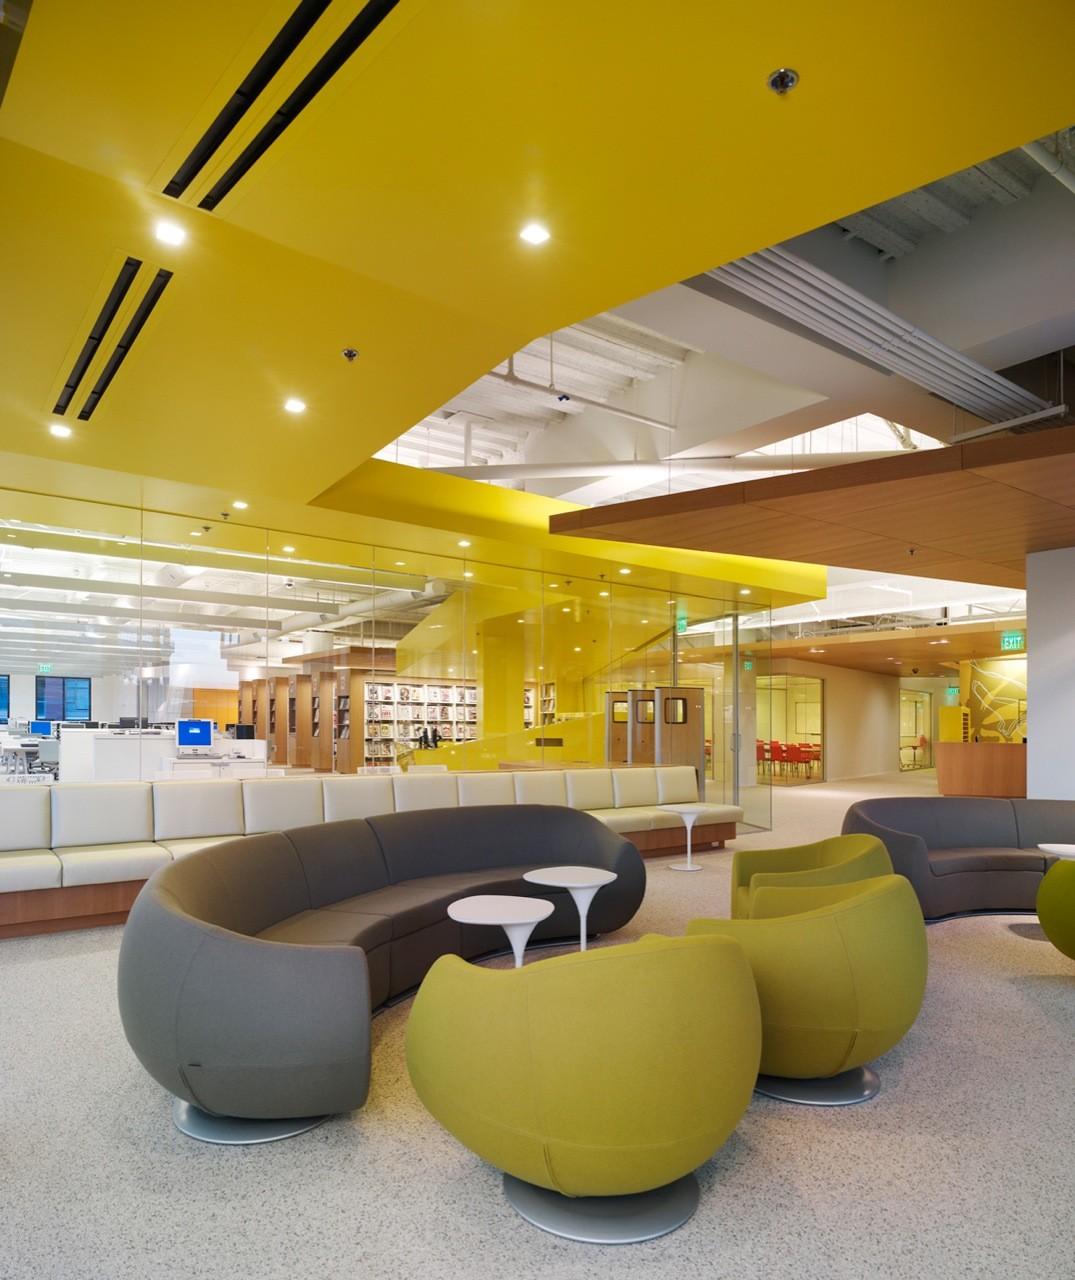 Fidm san diego campus clive wilkinson architects archdaily - Top interior design schools in california ...